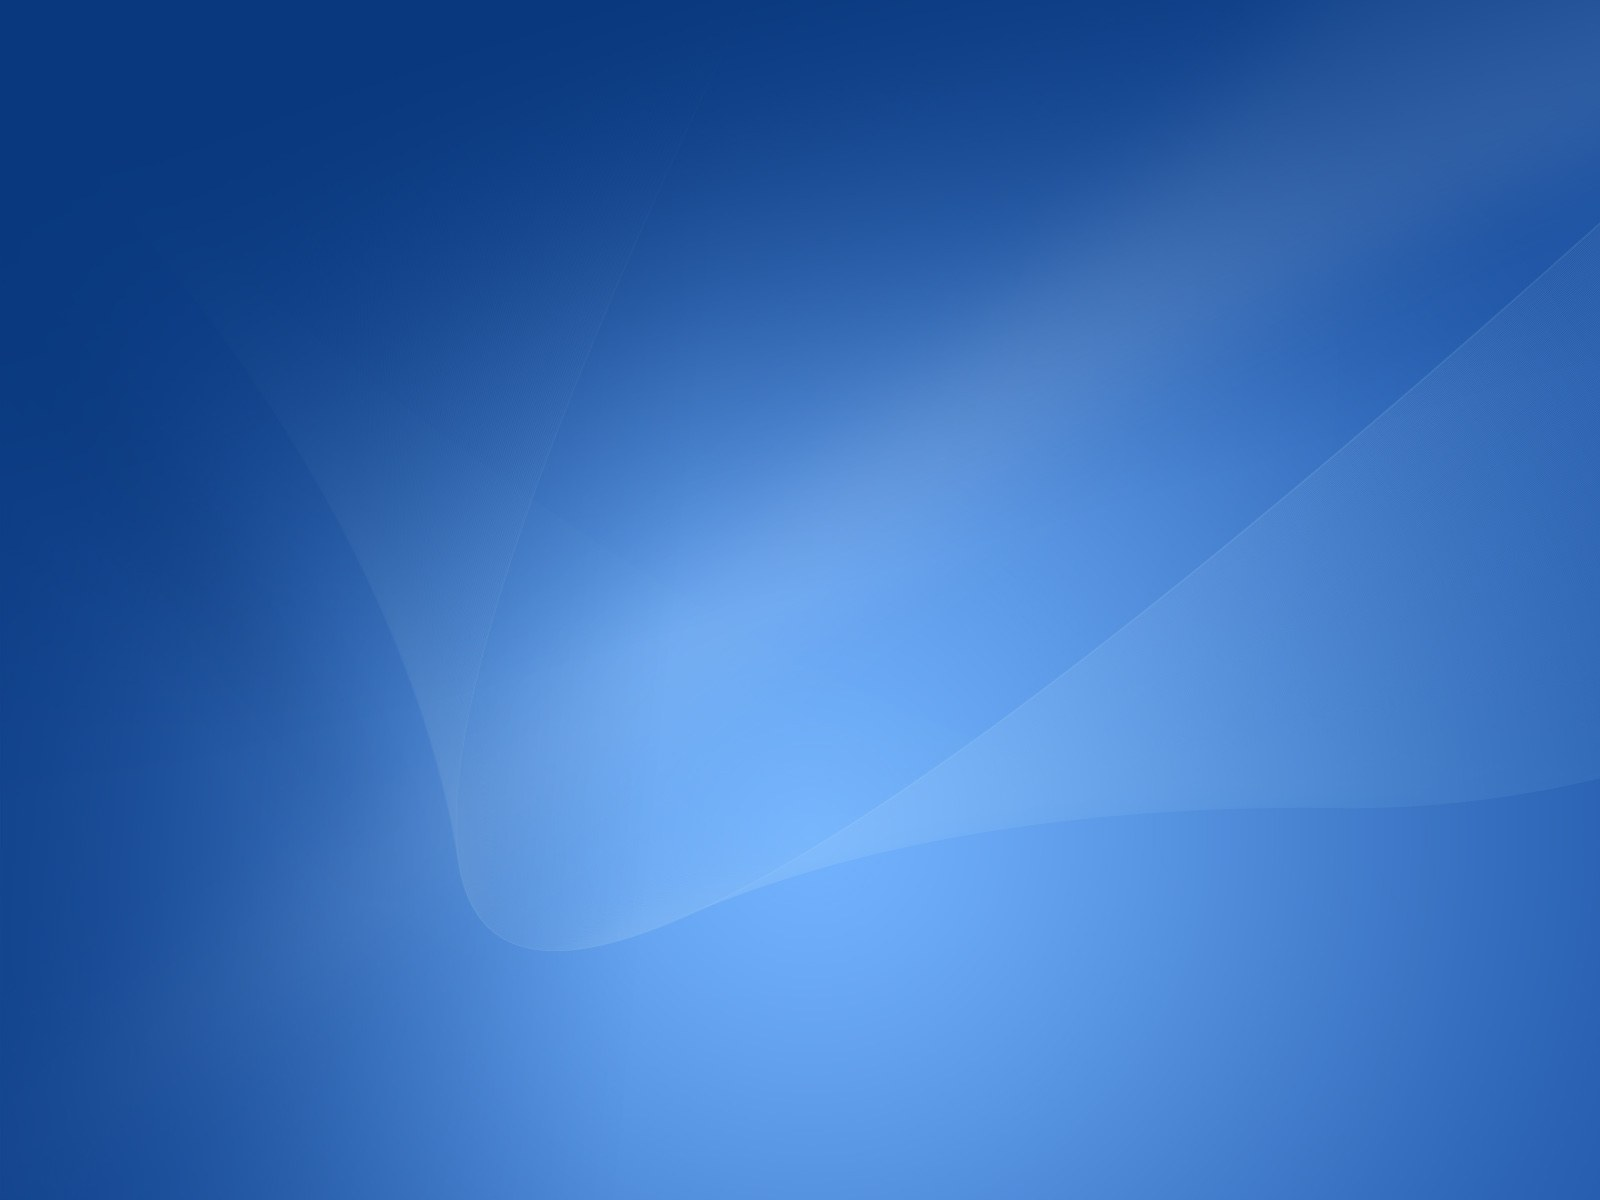 http://4.bp.blogspot.com/-rAclMXFqoPA/Tx9bL1c5JaI/AAAAAAAABhs/RMhwwWEdLvc/s1600/Brushed_mac_osx_wallpaper_by_Maxtorade.jpg